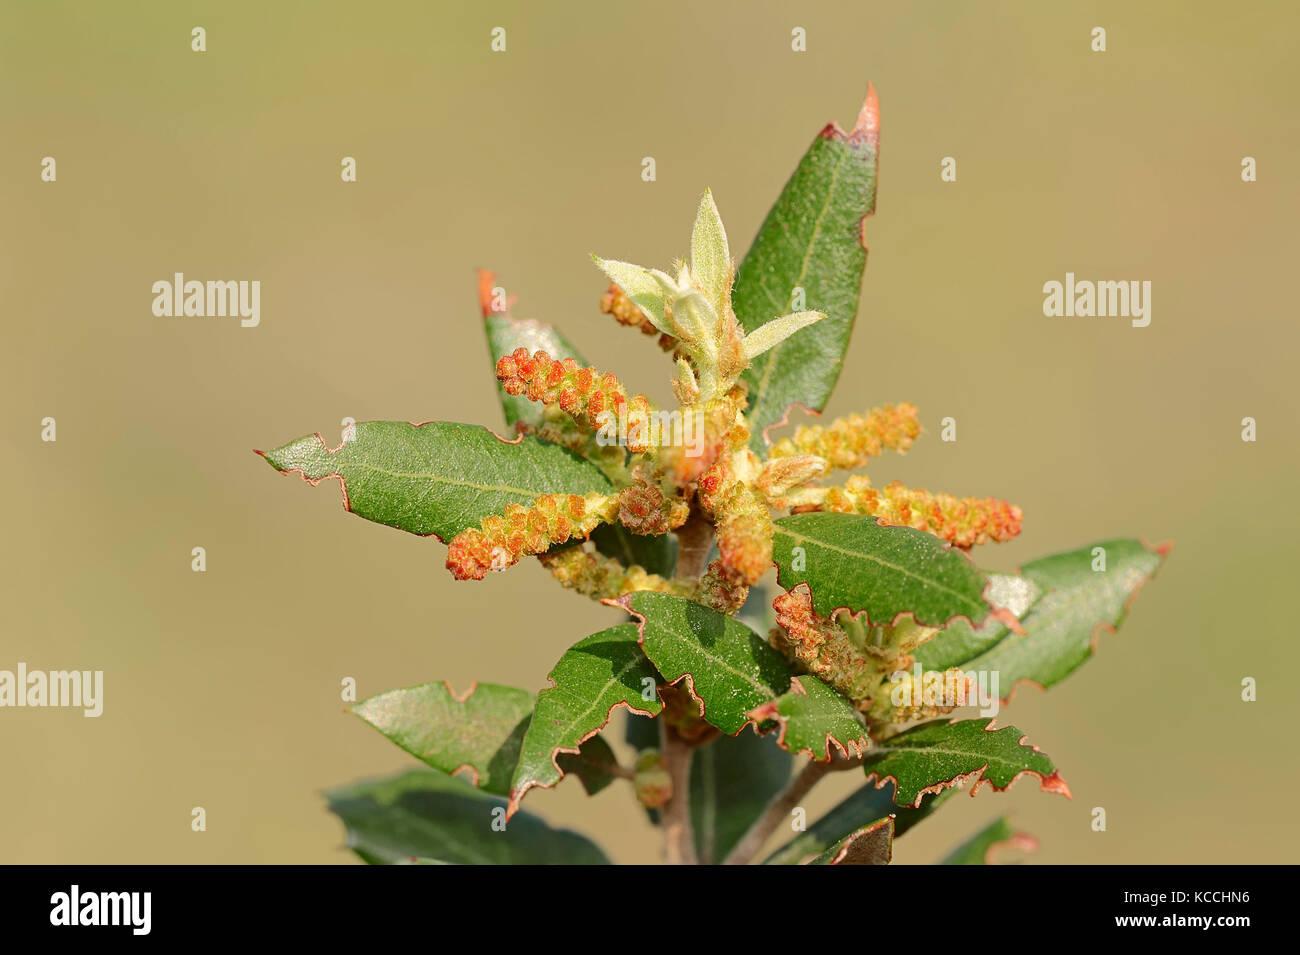 Quercus Coccifera Stock s & Quercus Coccifera Stock